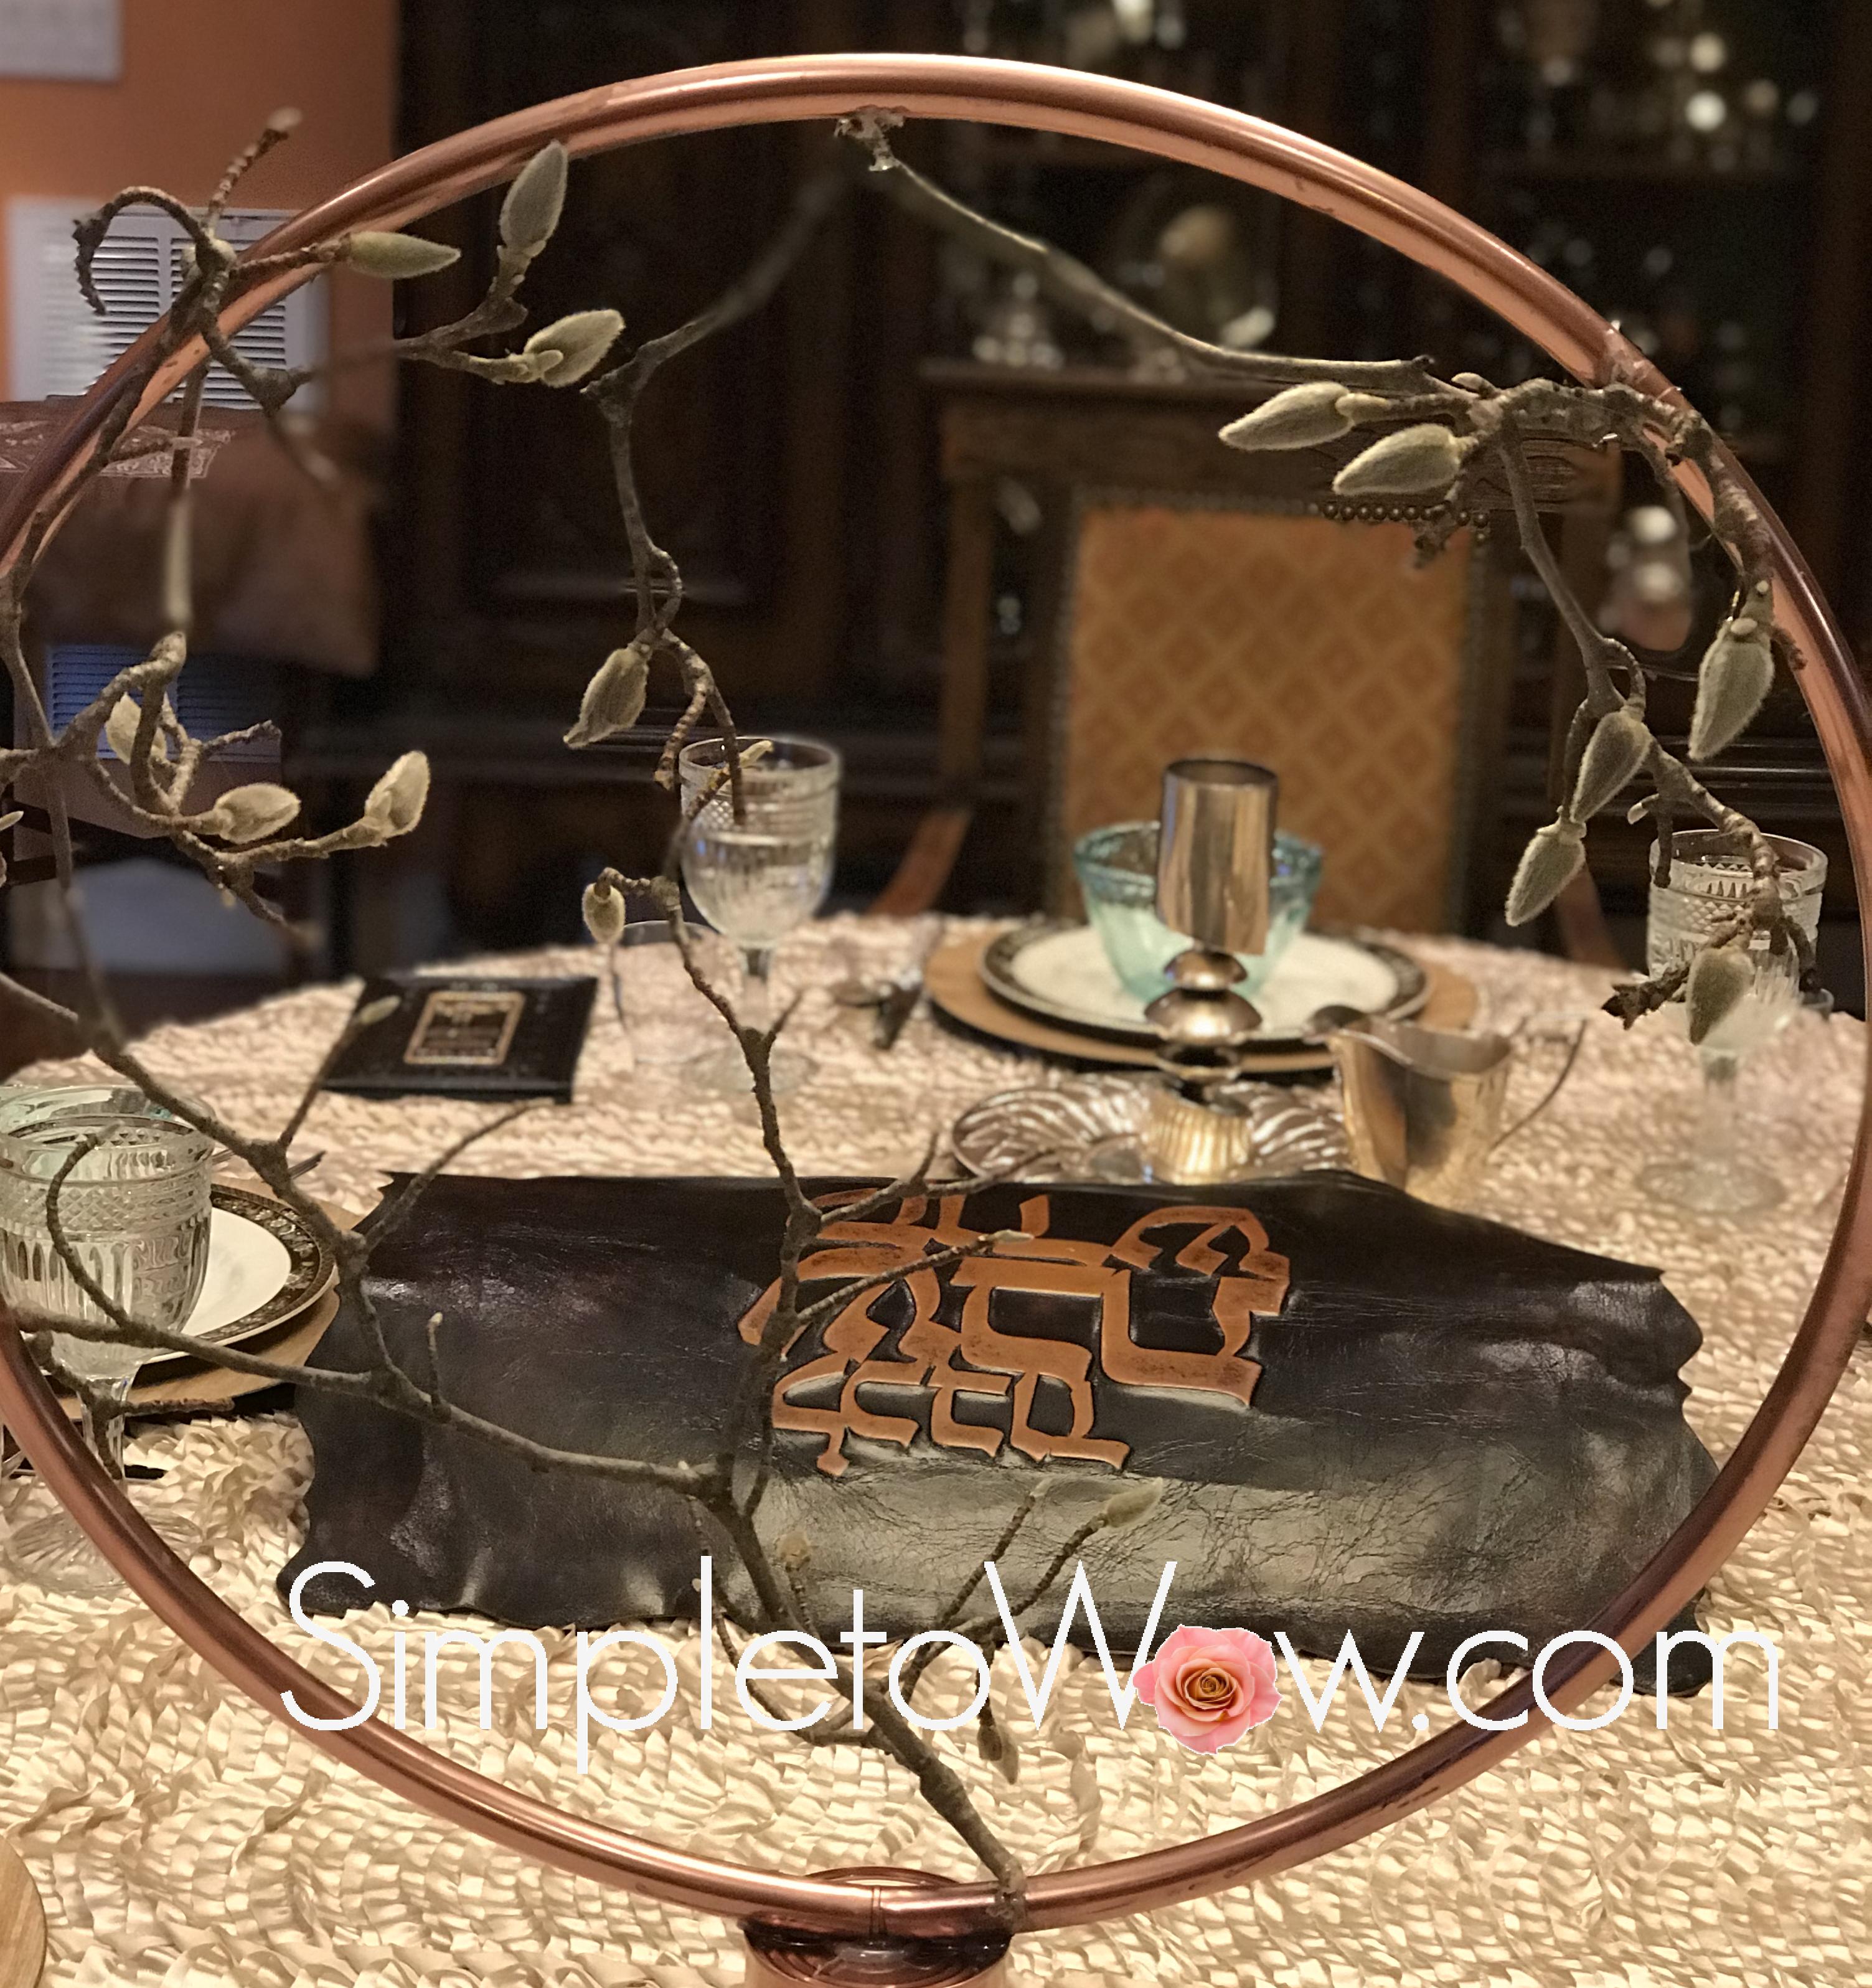 shabbos table through copper hoop arrangement